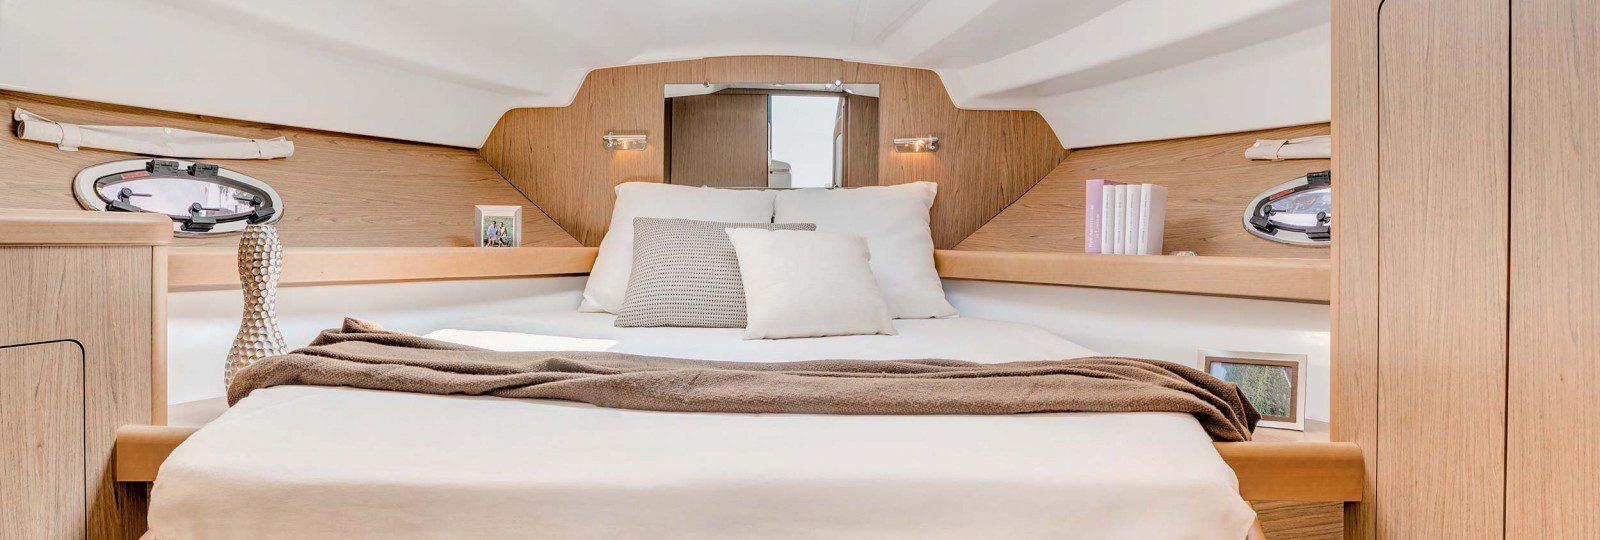 Beneteau Antares 30 master cabin